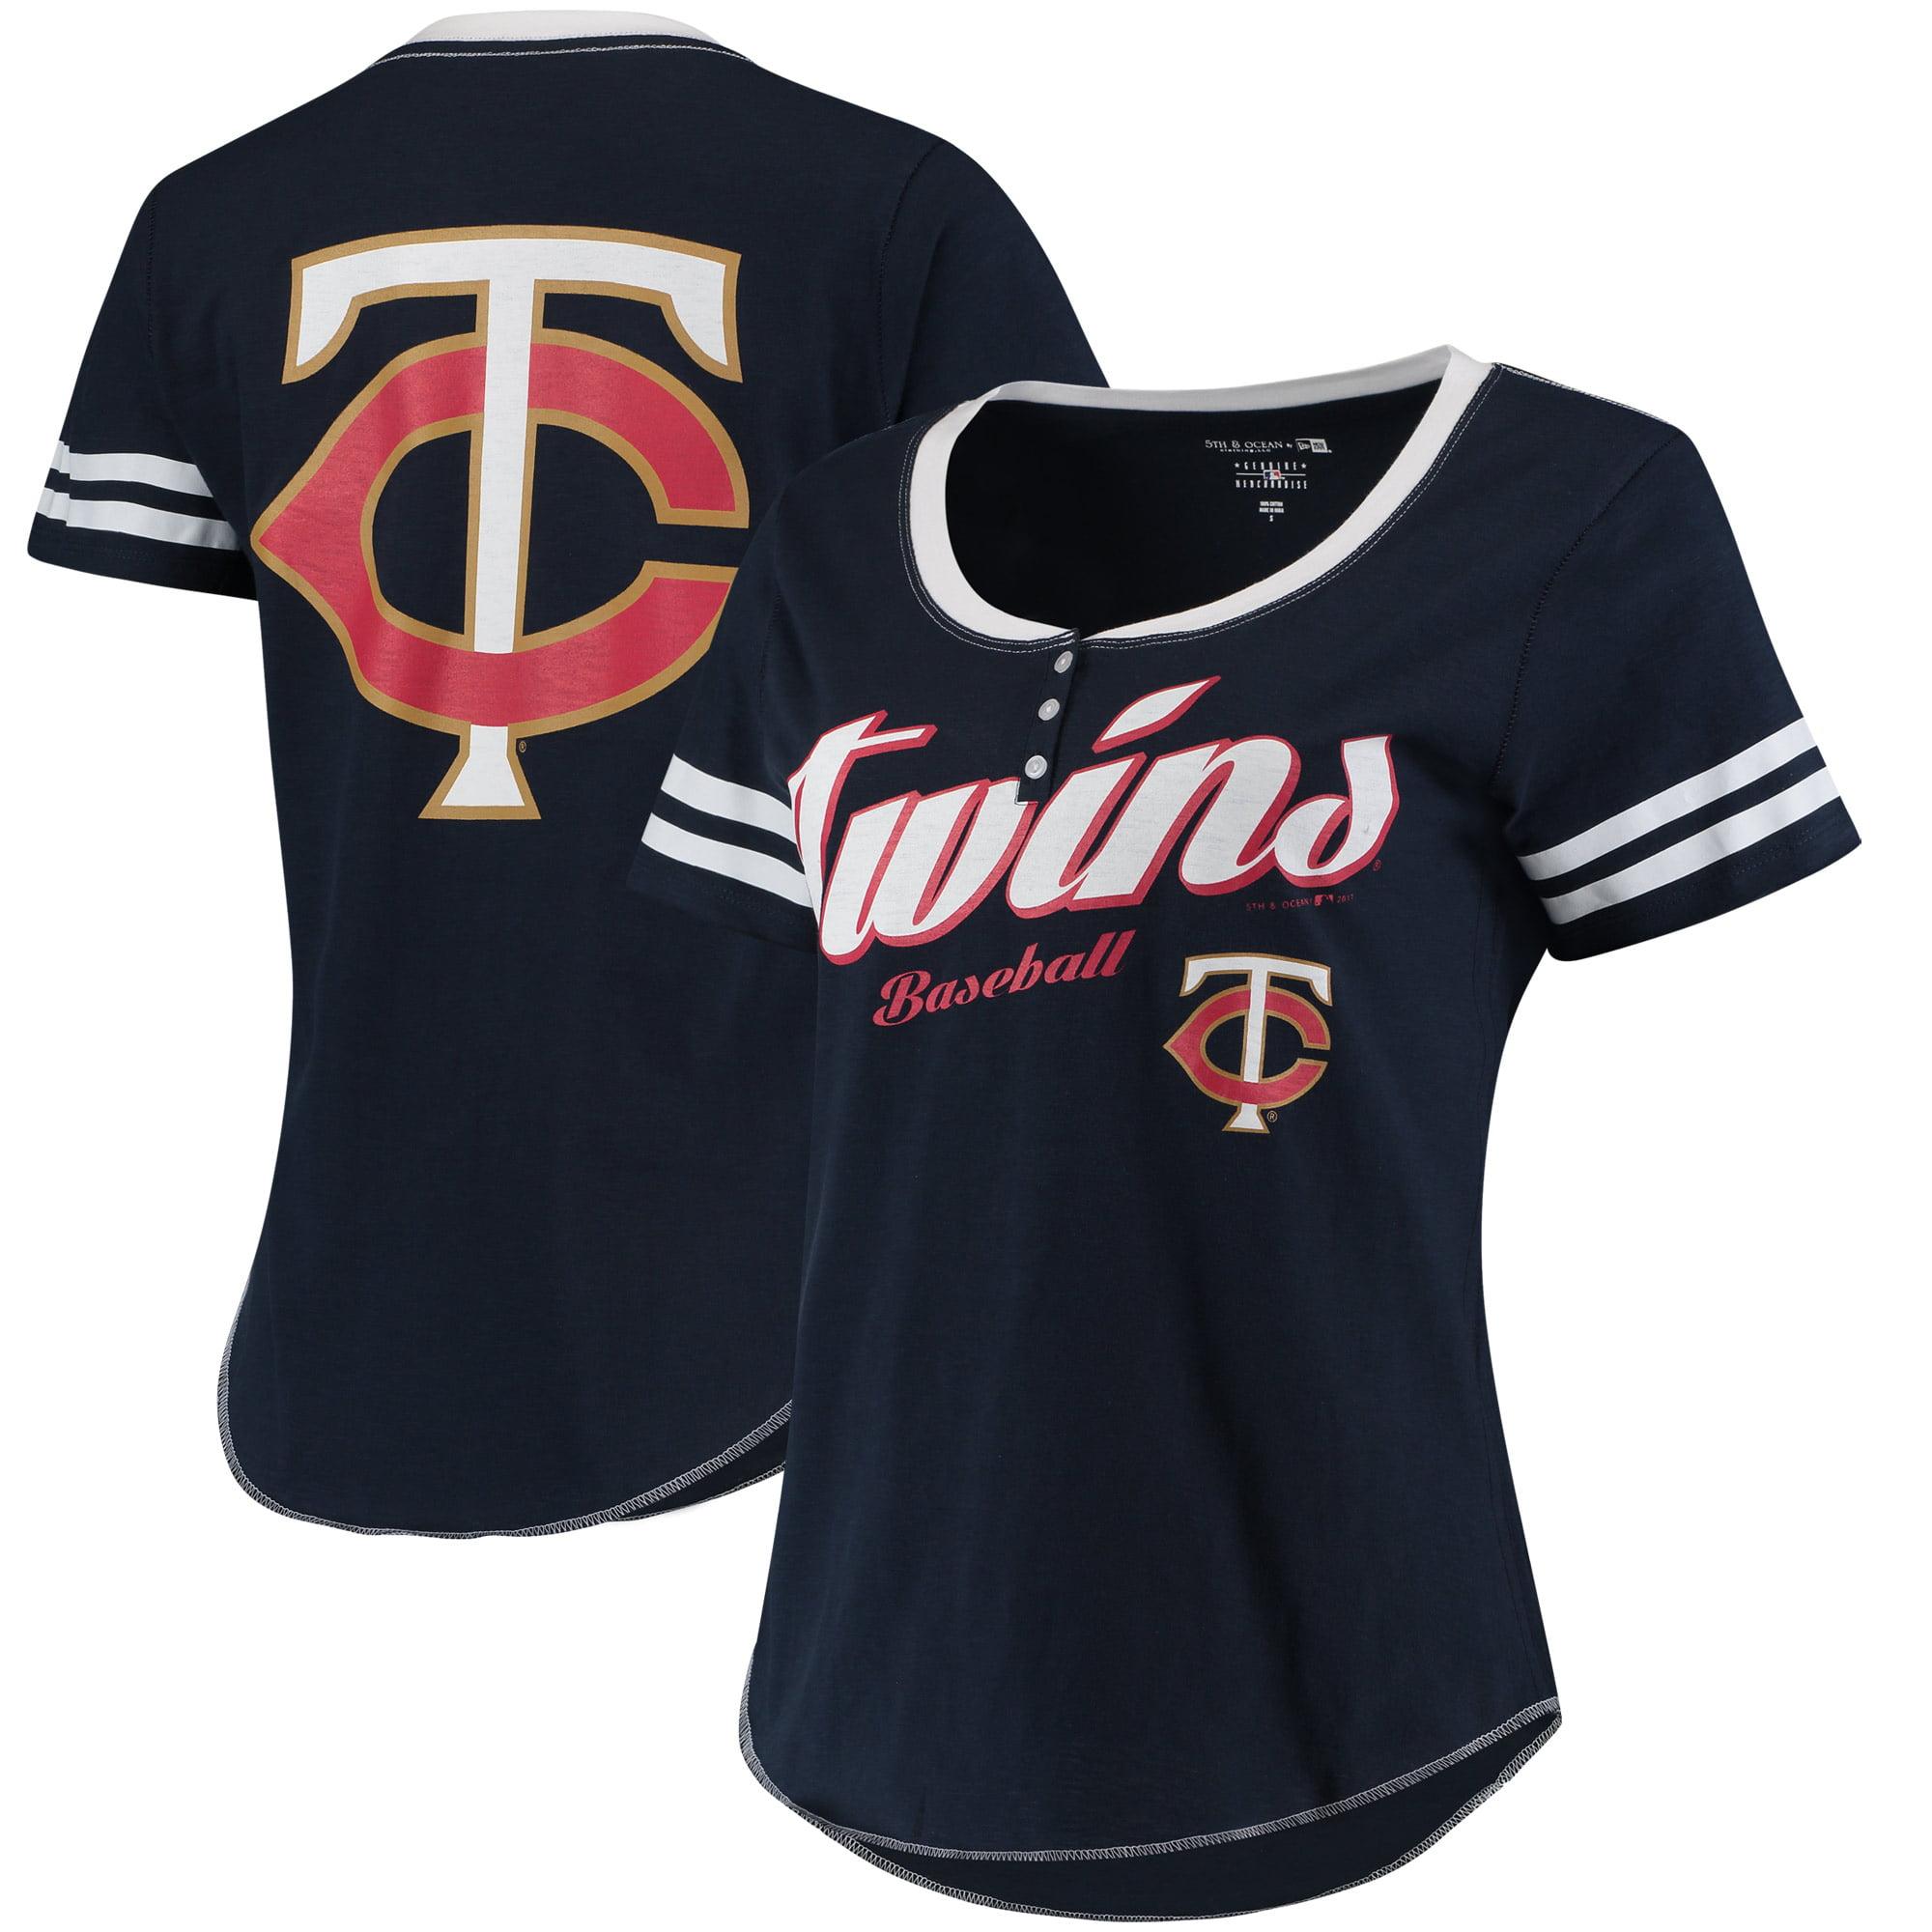 Minnesota Twins 5th & Ocean by New Era Women's Slub Henley T-Shirt - Navy/White